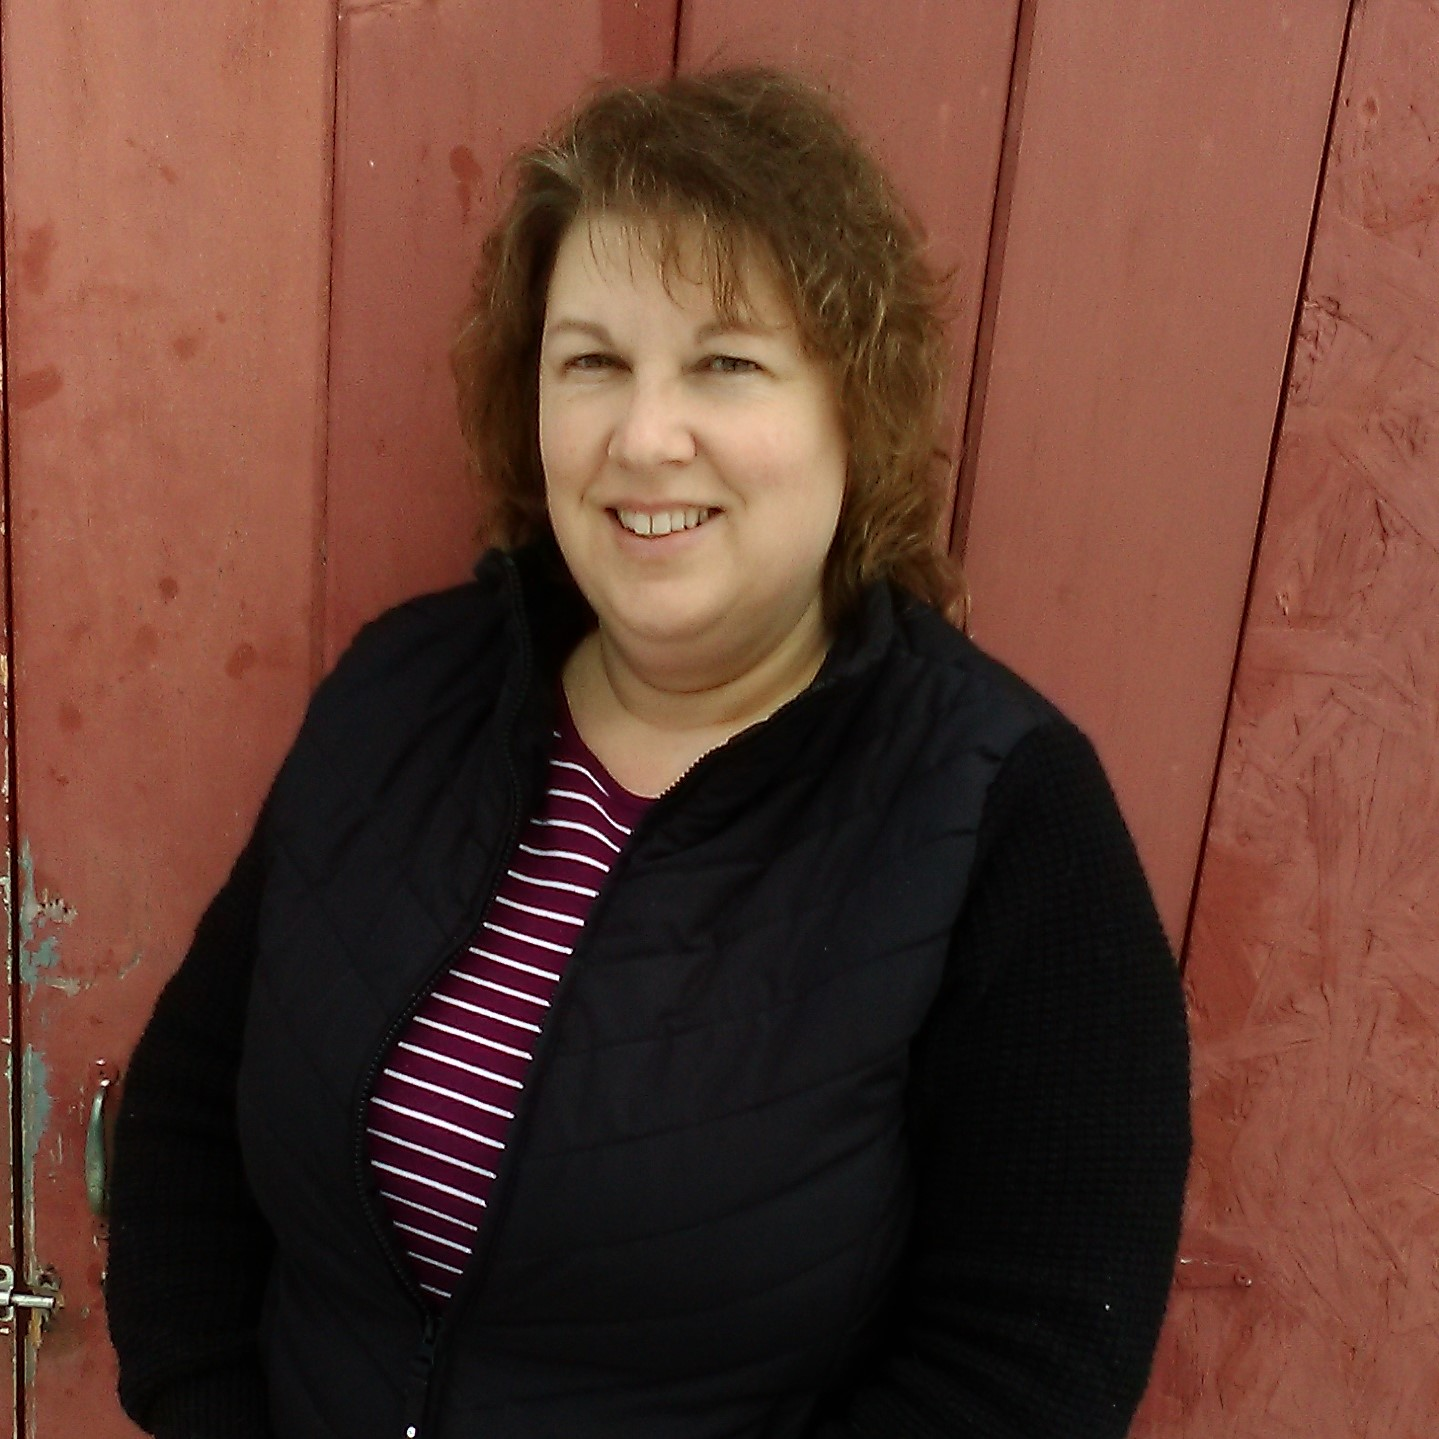 Amy Touchette - - amyt@gmssi.org